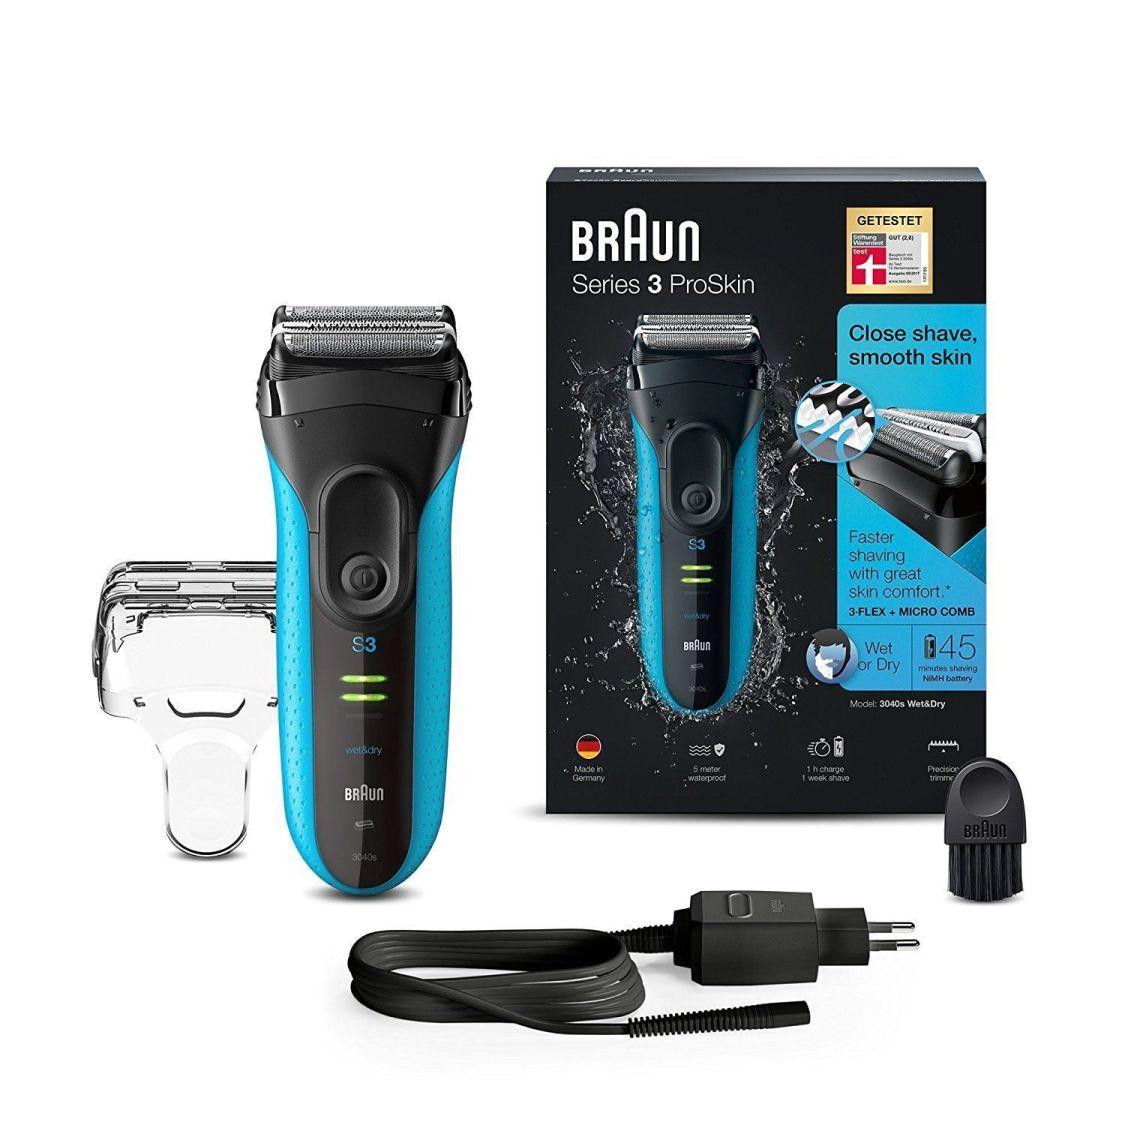 ✓ BRAUN Series 3 ProSkin 3040s, Wet&Dry, Rasierer/Elektrorasierer Schwarz/Blau ✓